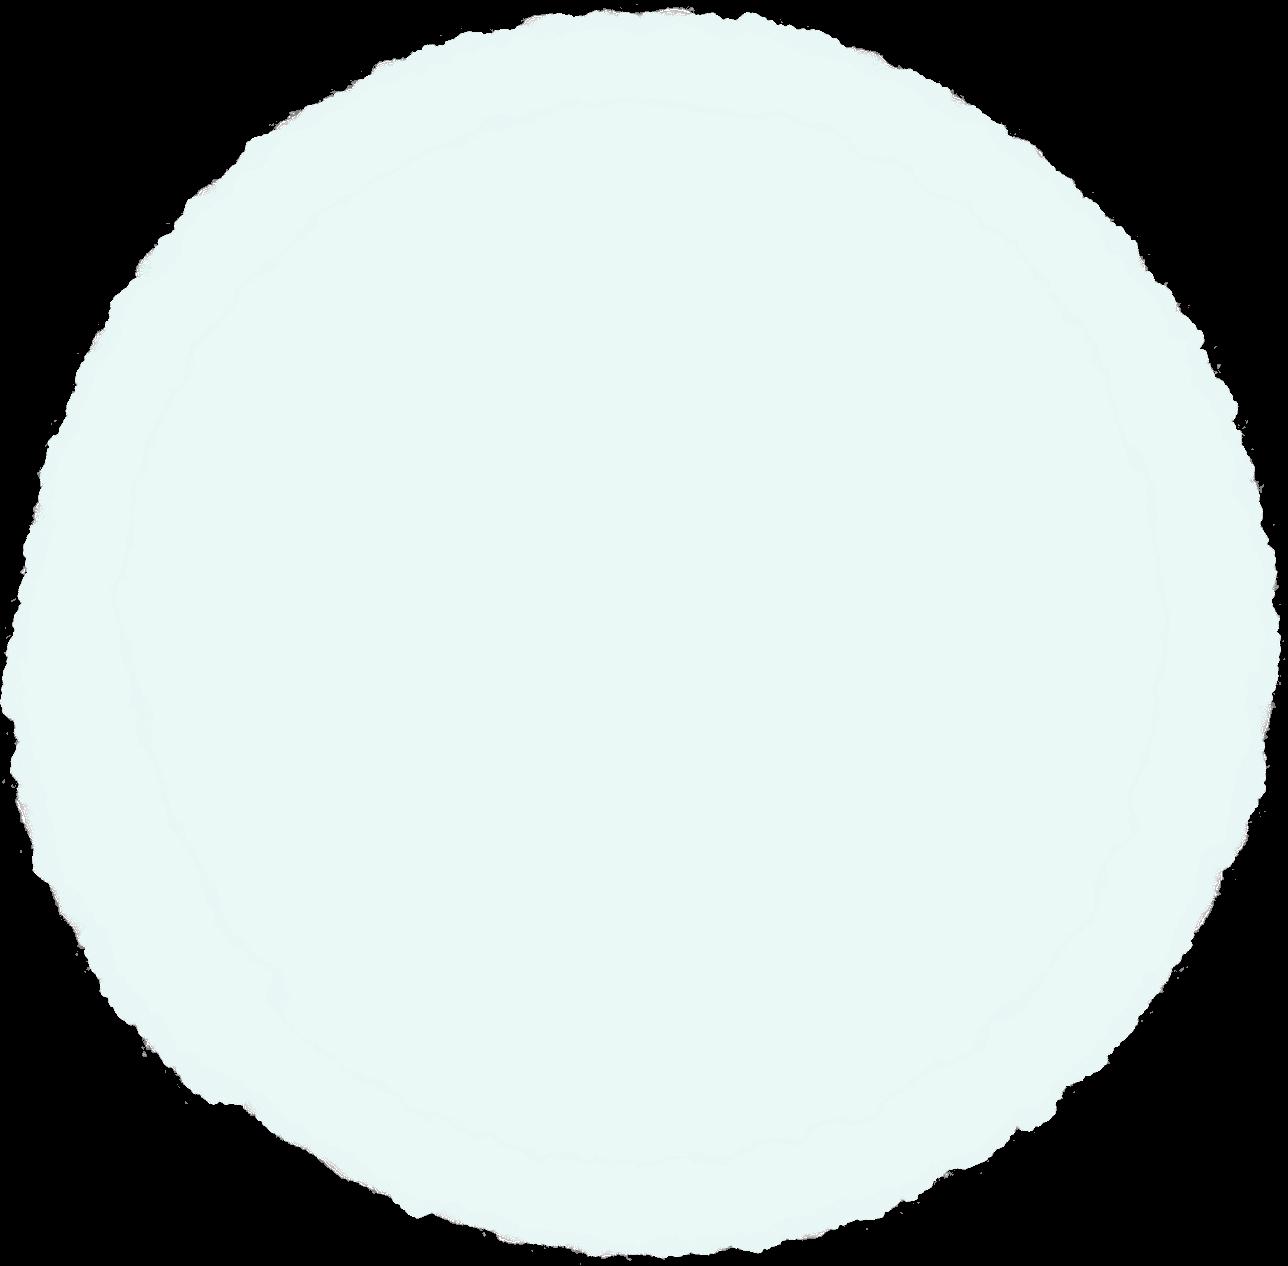 Trustle circle 1